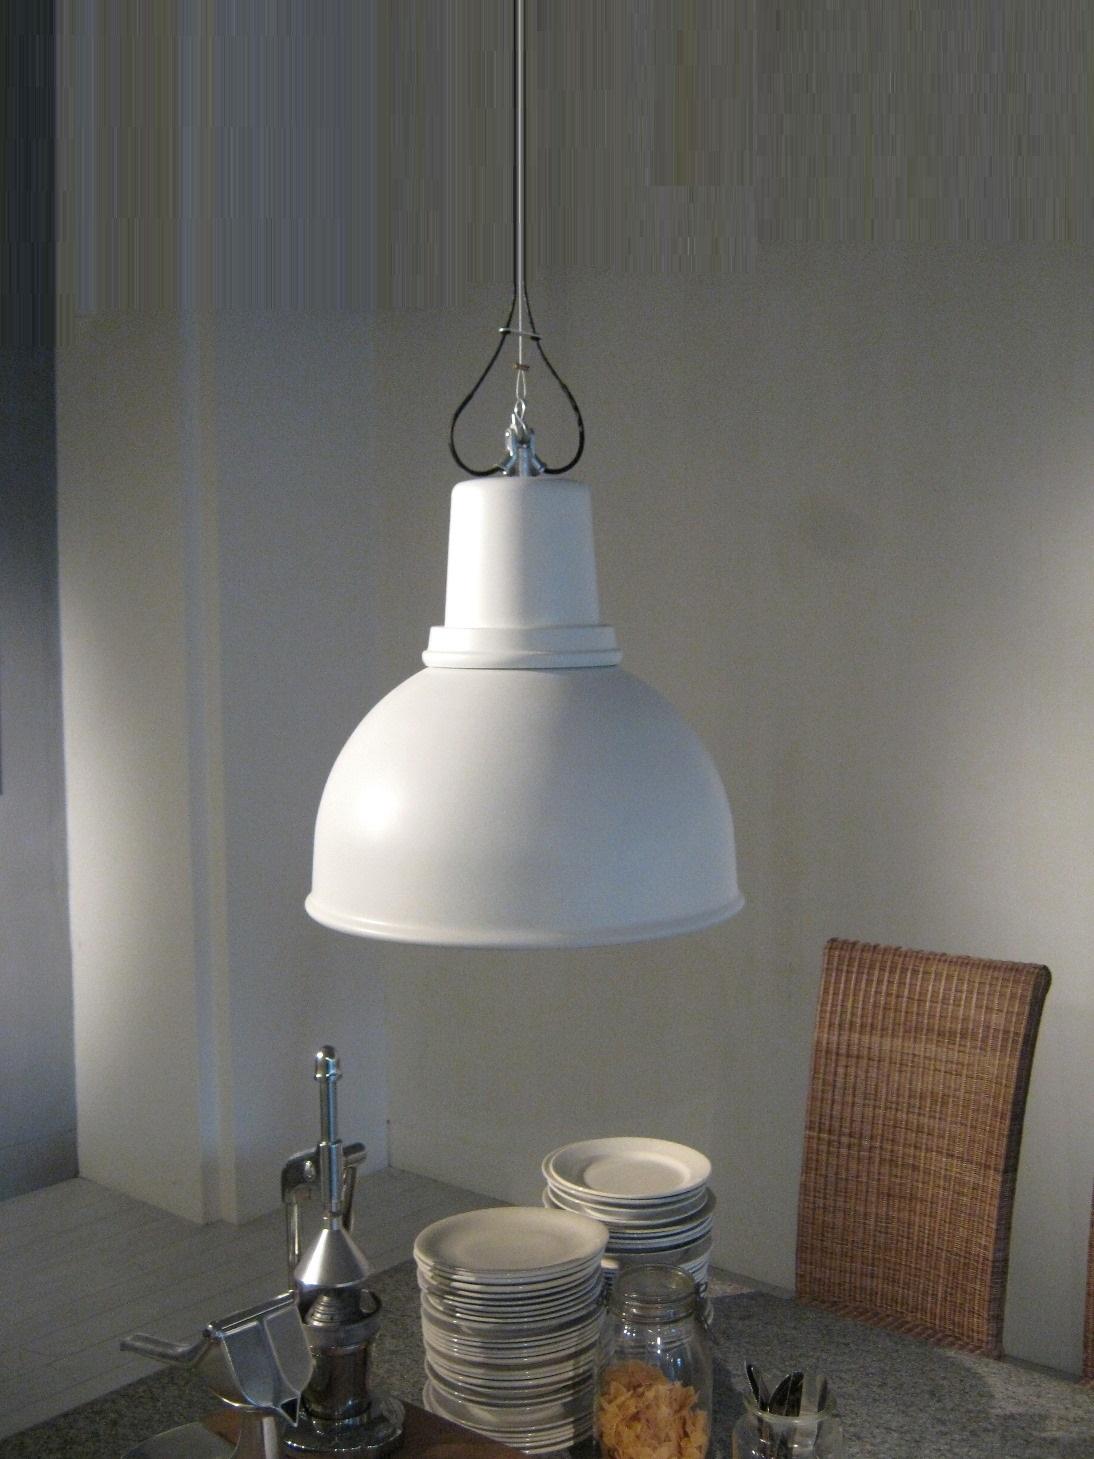 Boffi illuminazione lampade a sospensione naviglio boffi for Lampade a sospensione